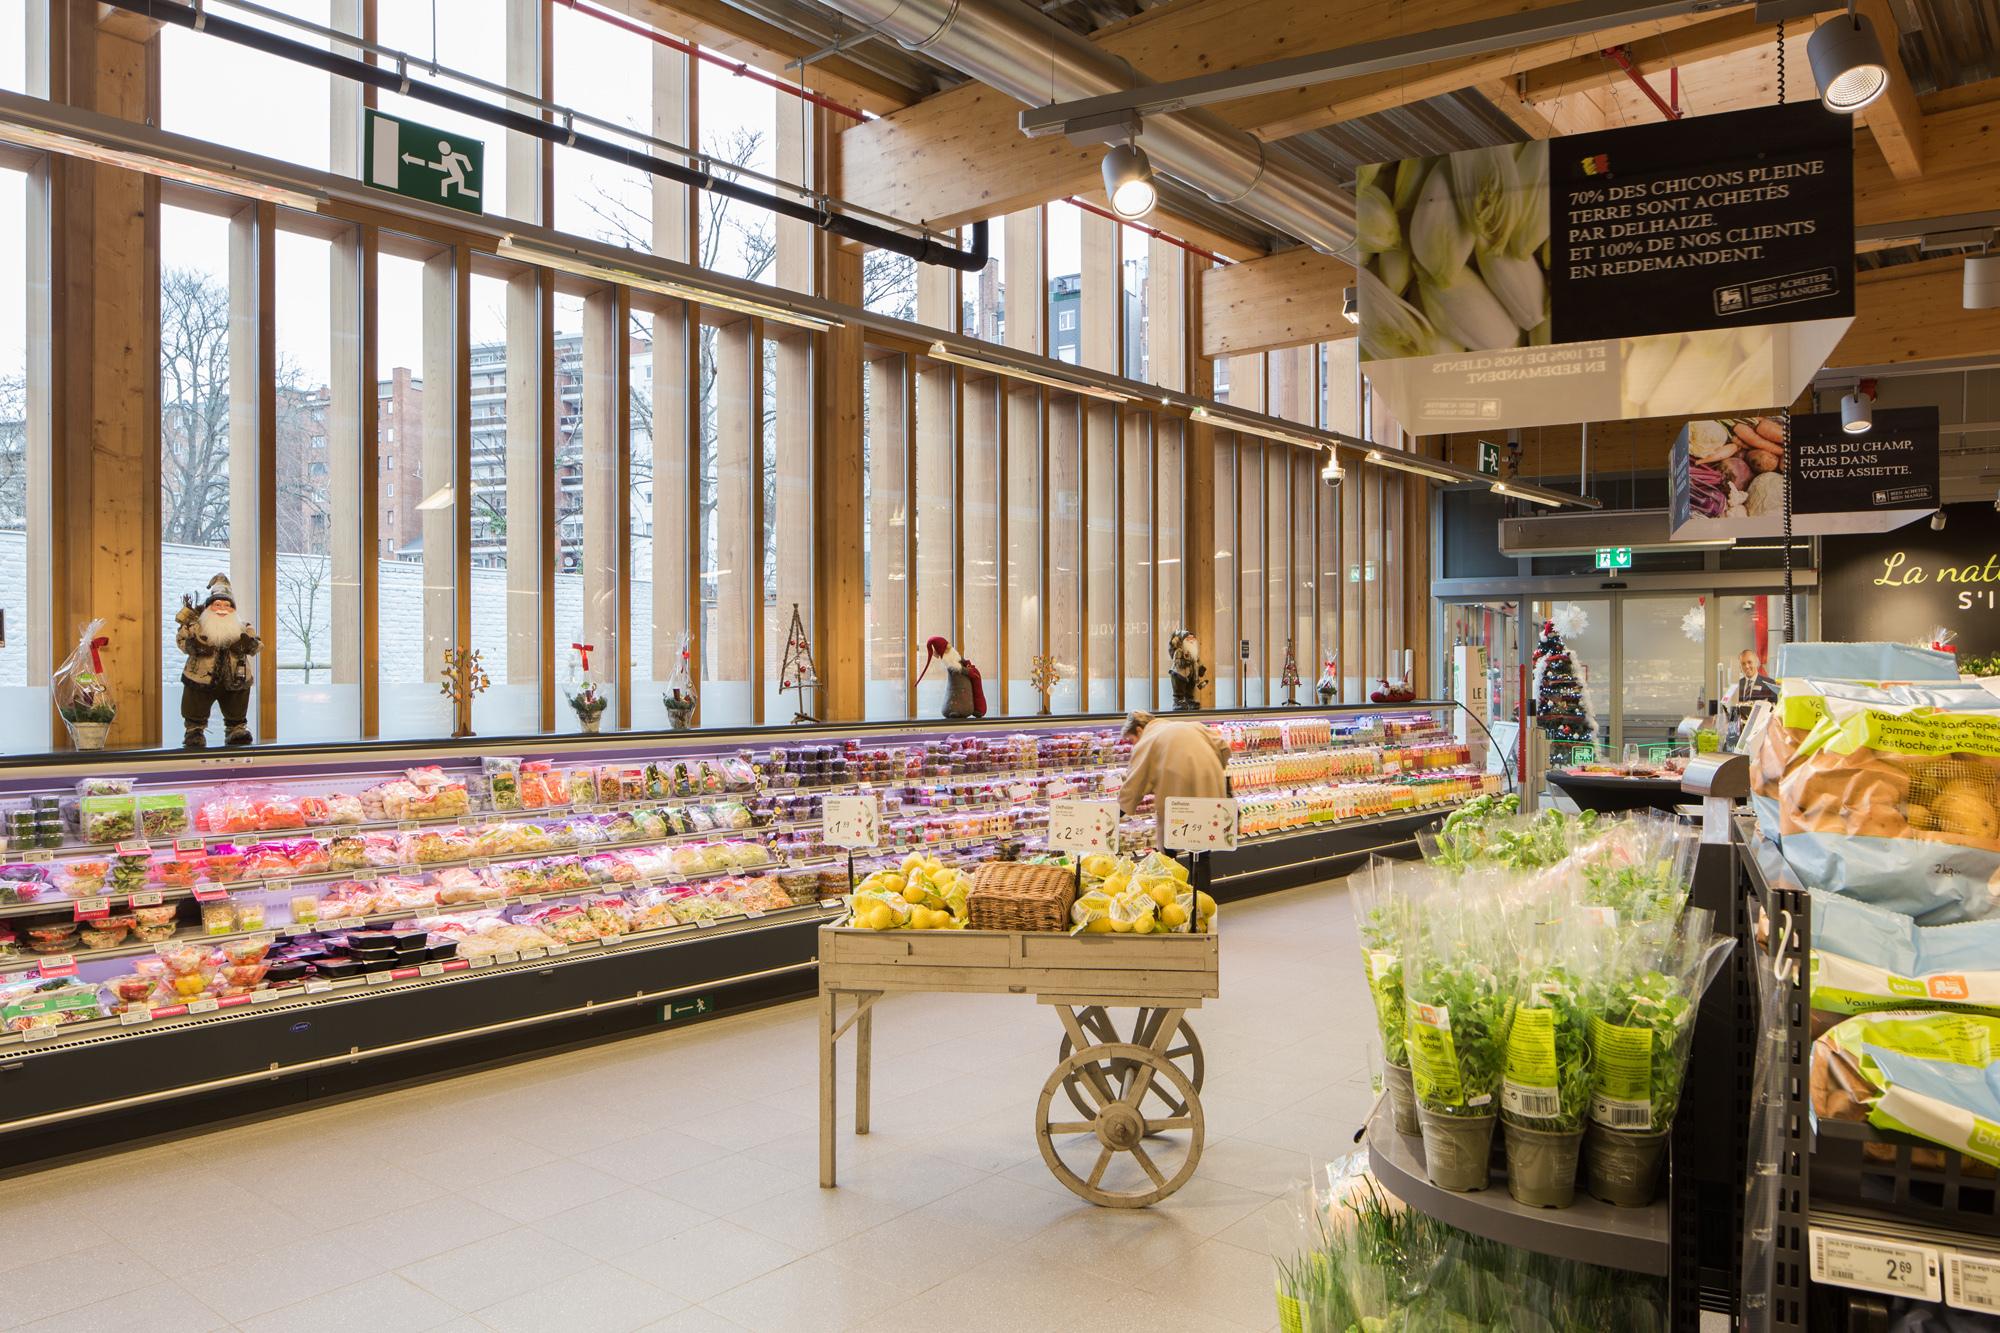 layout of delhaize de leeuw supermarket